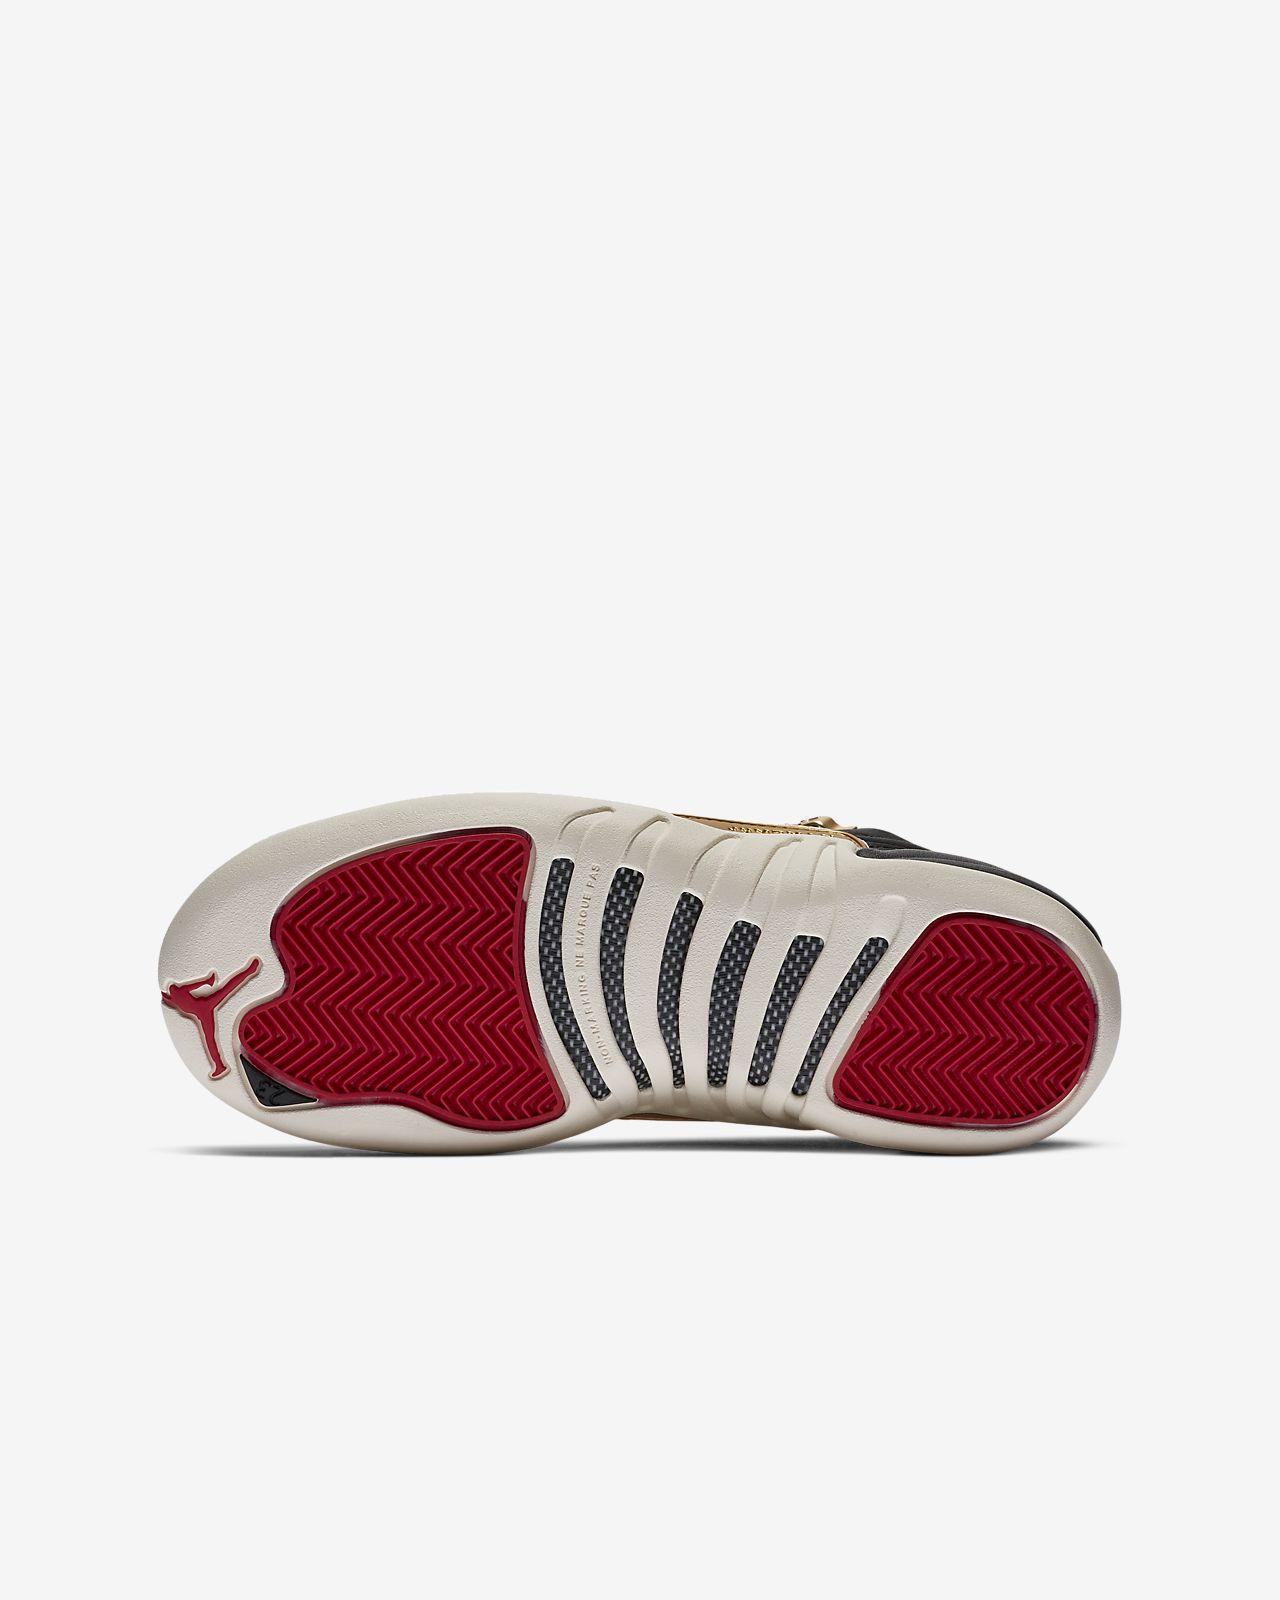 997d654fa0be82 Air Jordan 12 Retro CNY Big Kids  Shoe. Nike.com